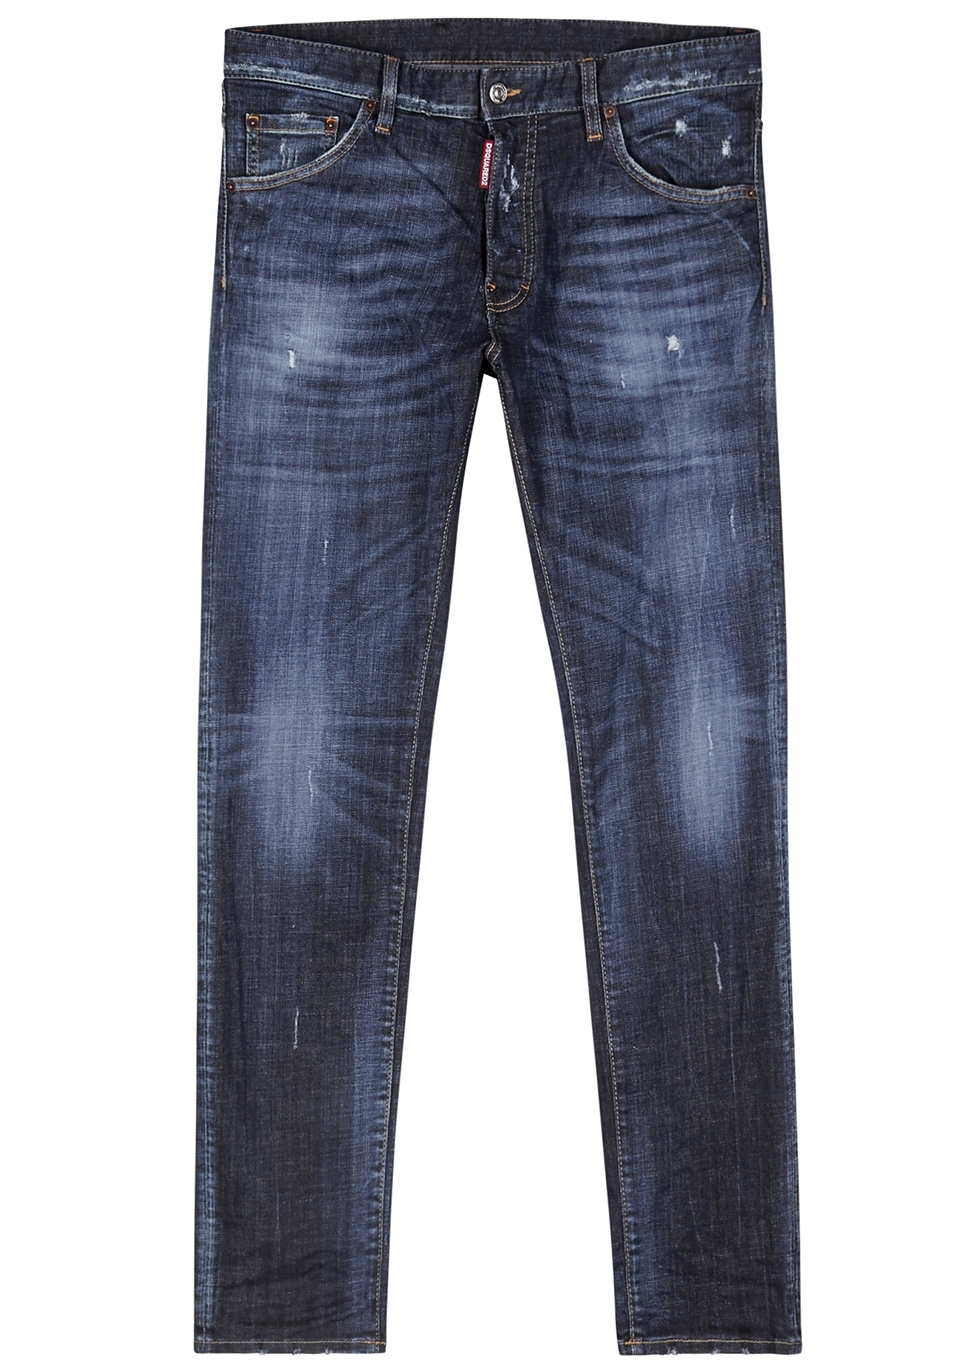 69b4764ad9 Men s Designer Jeans and Luxury Denim - Harvey Nichols